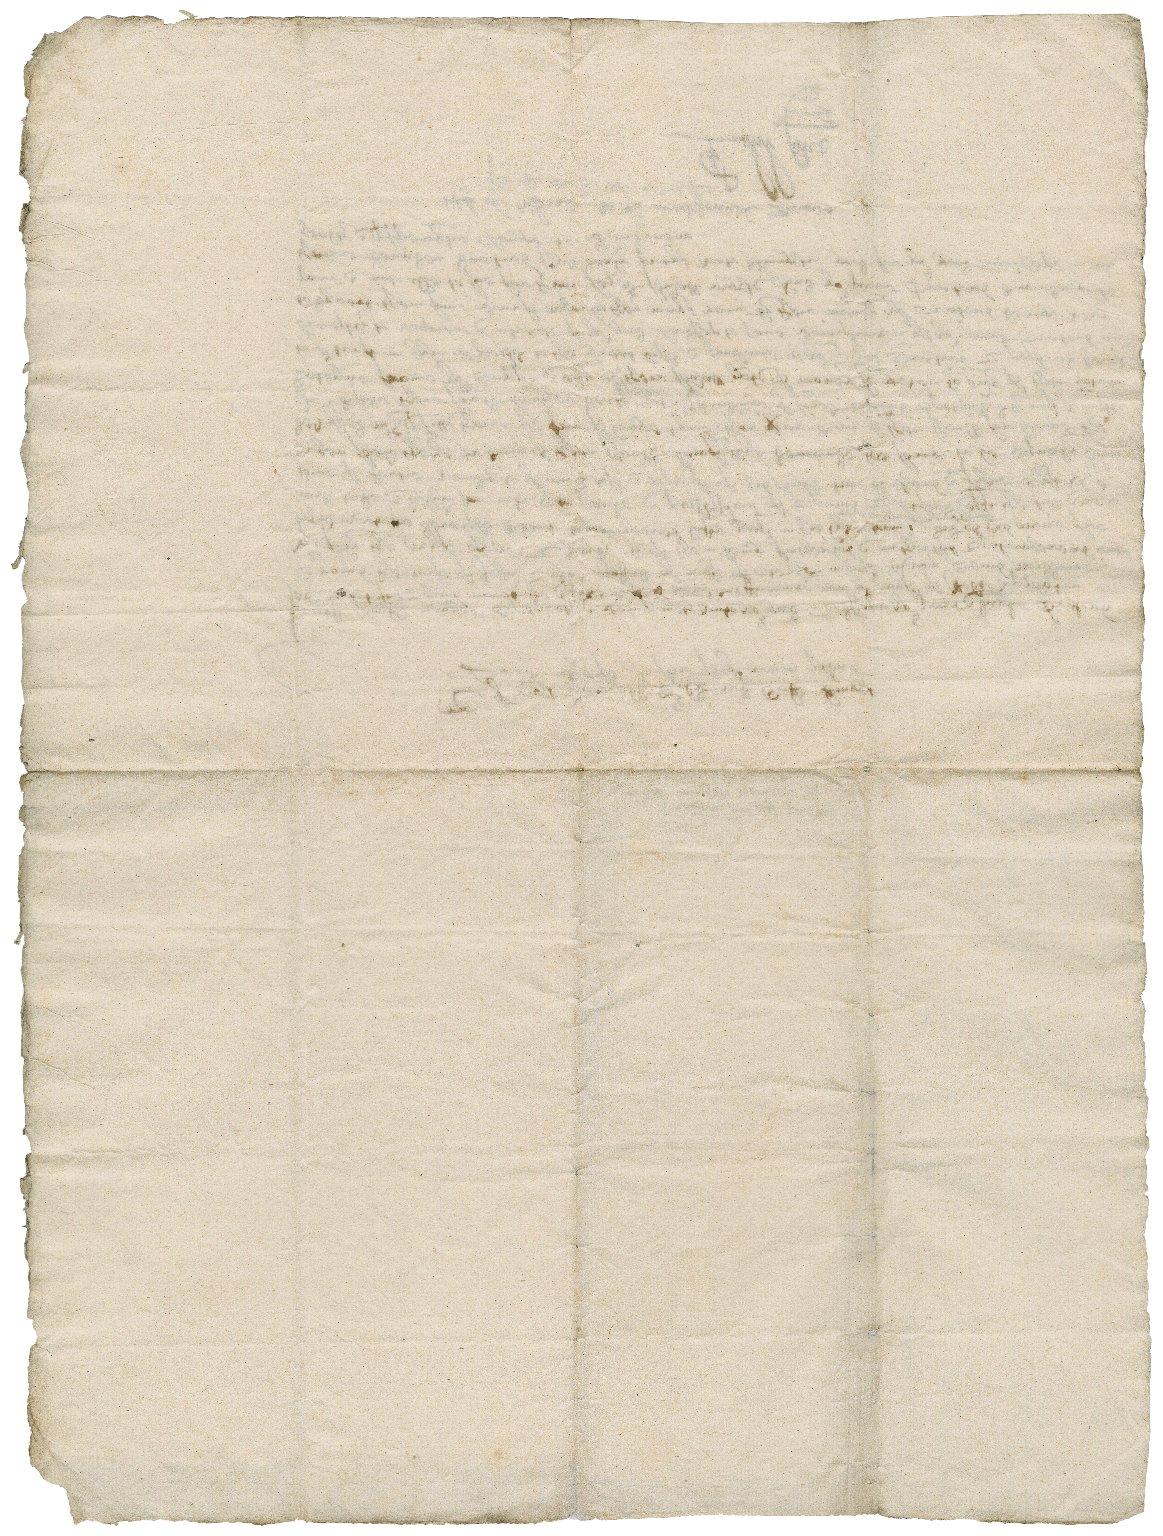 Petition touching Thomas Thetford from Moretoft heirs to Sir Edward Coke